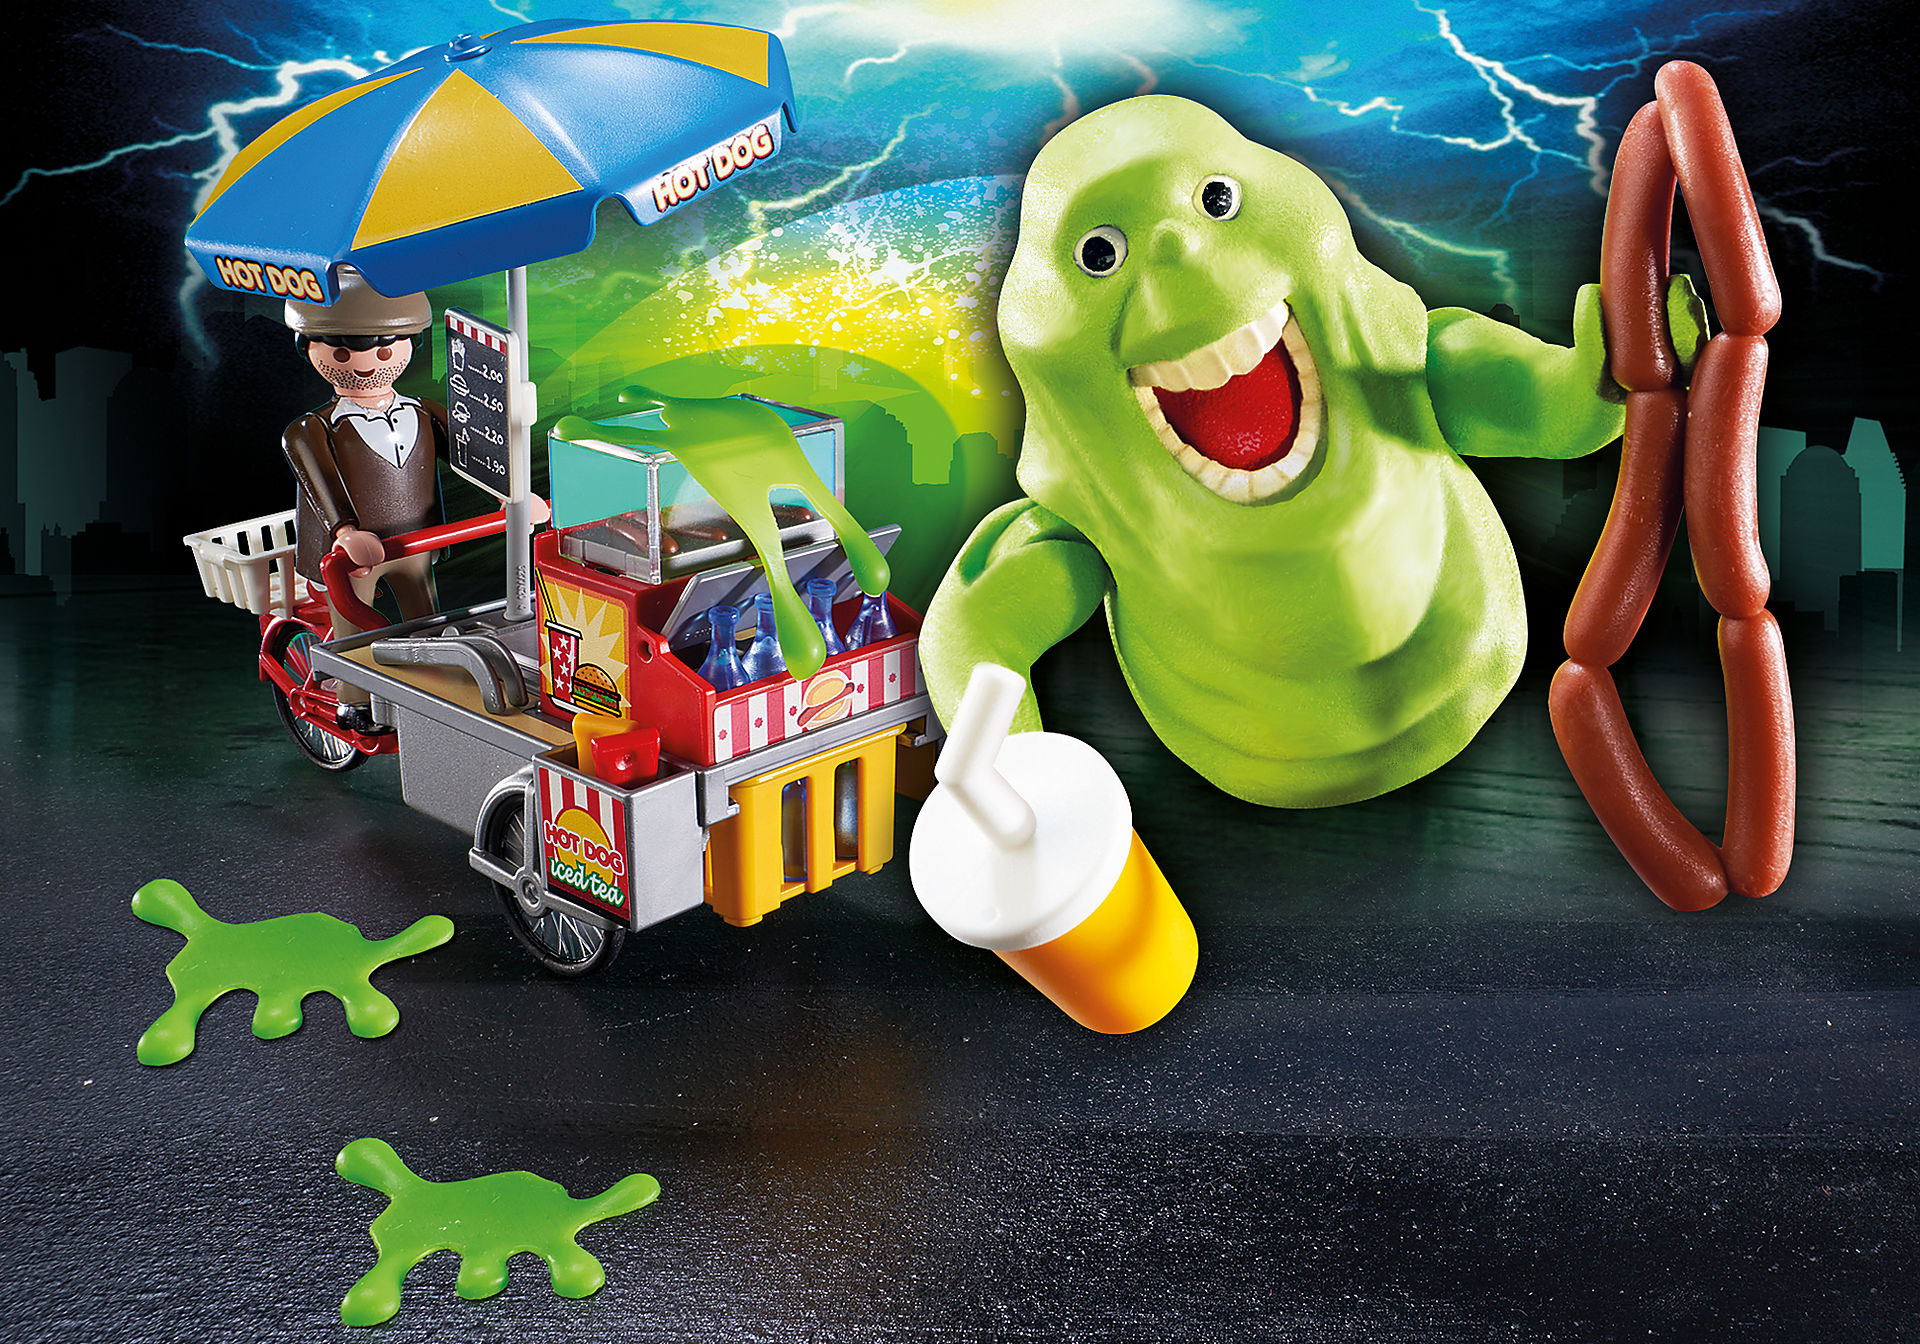 http://media.playmobil.com/i/playmobil/9222_product_extra1/Slimer med hotdog-pølsevogn